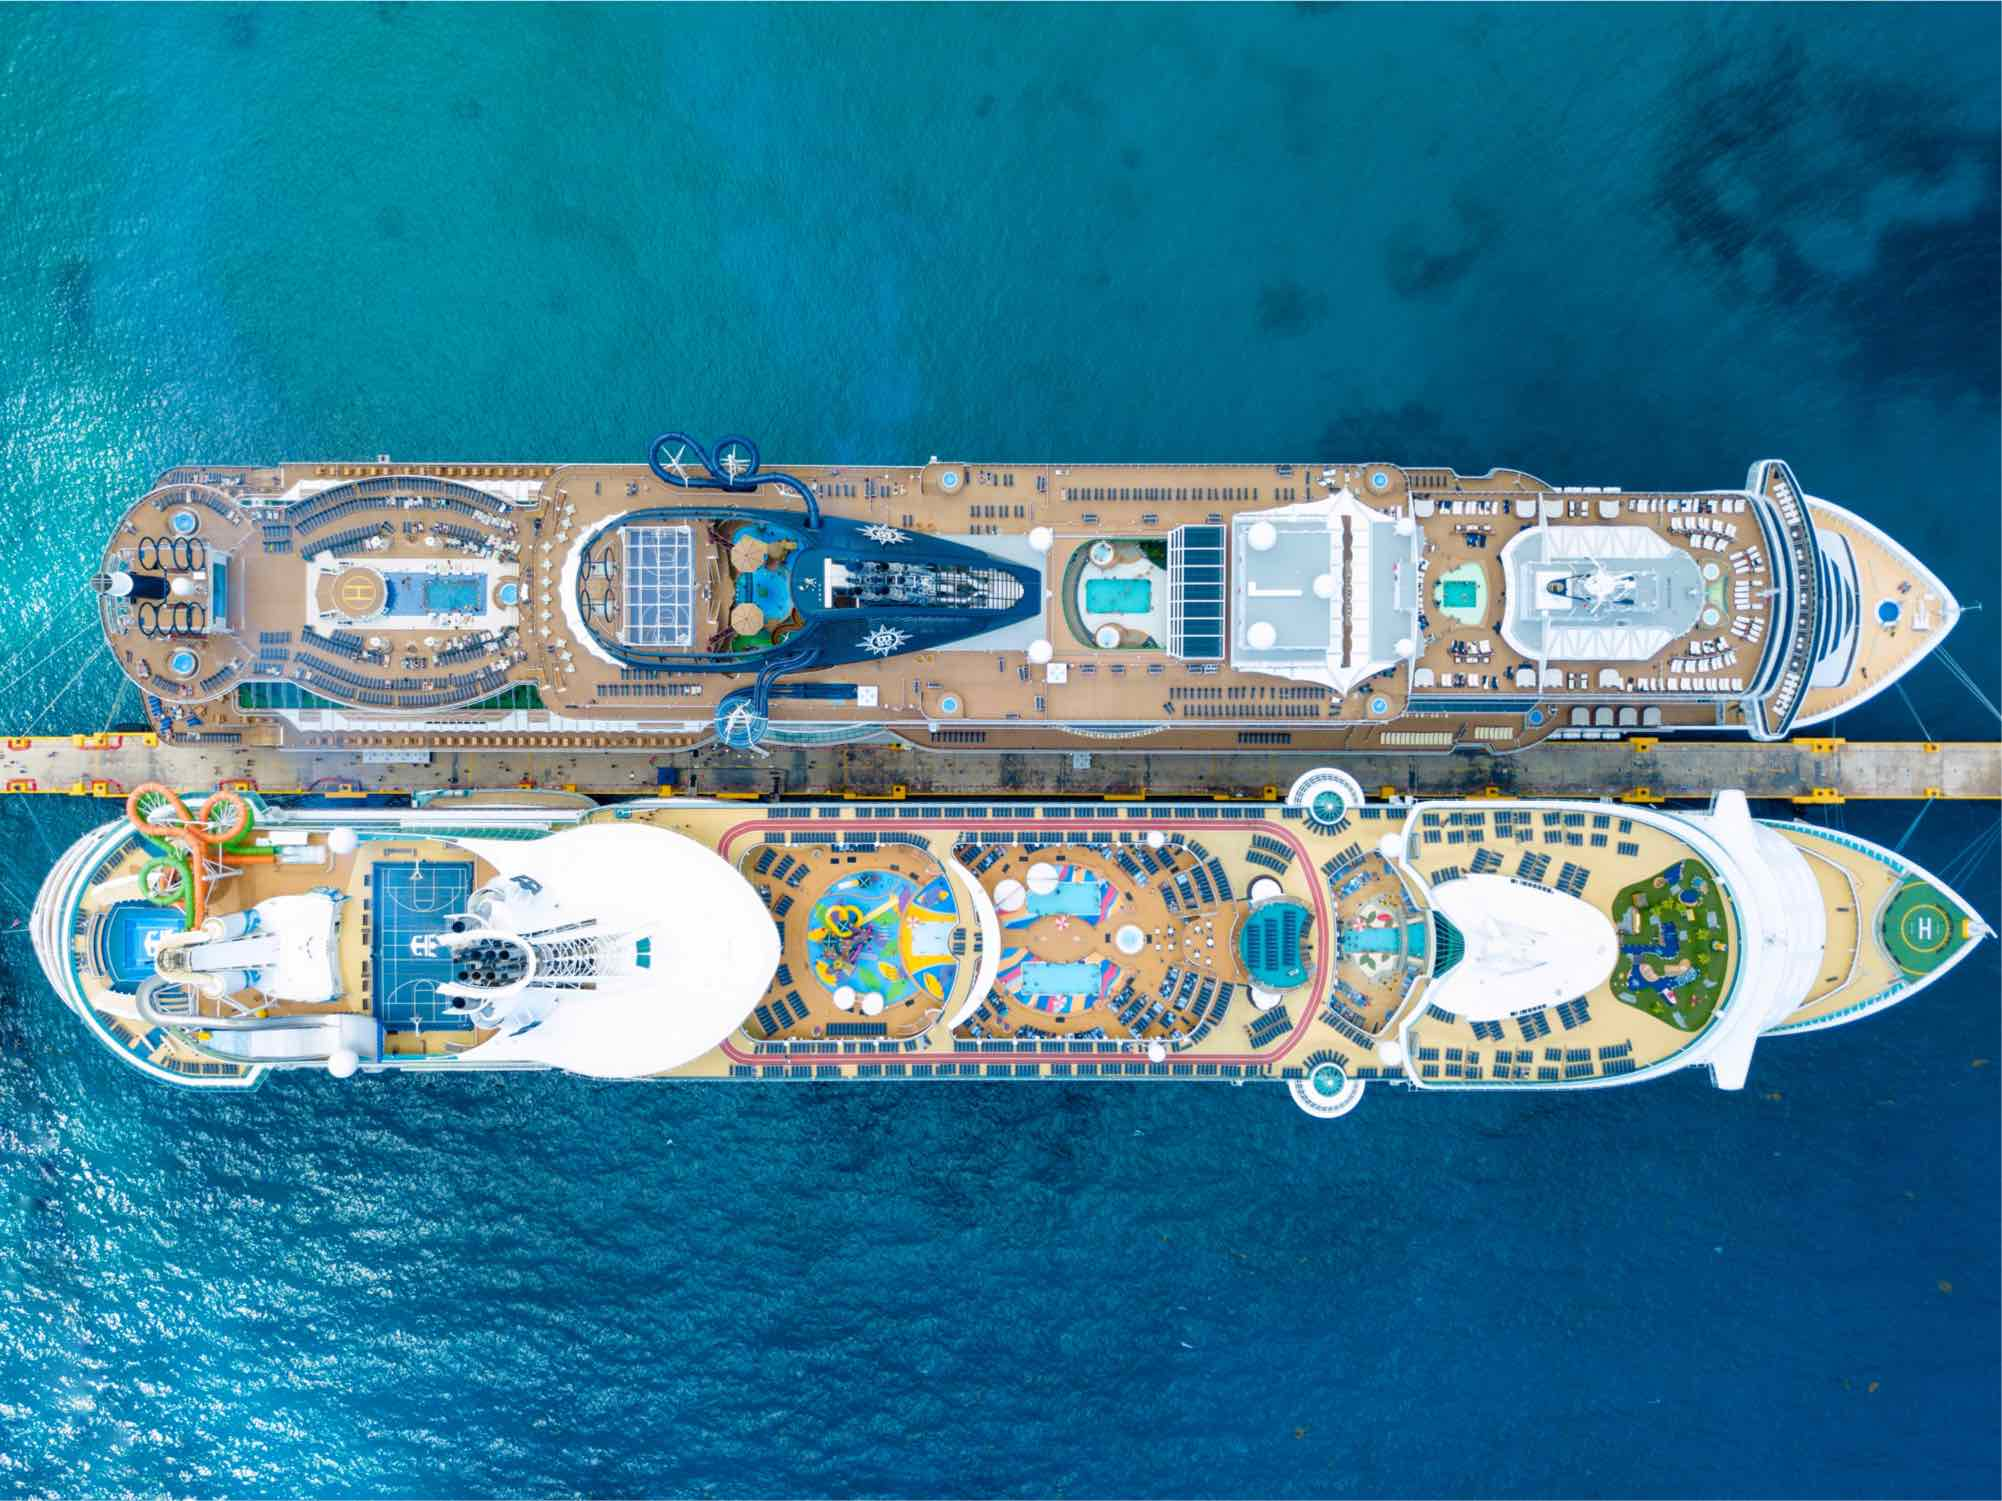 Cruise ship pollution above